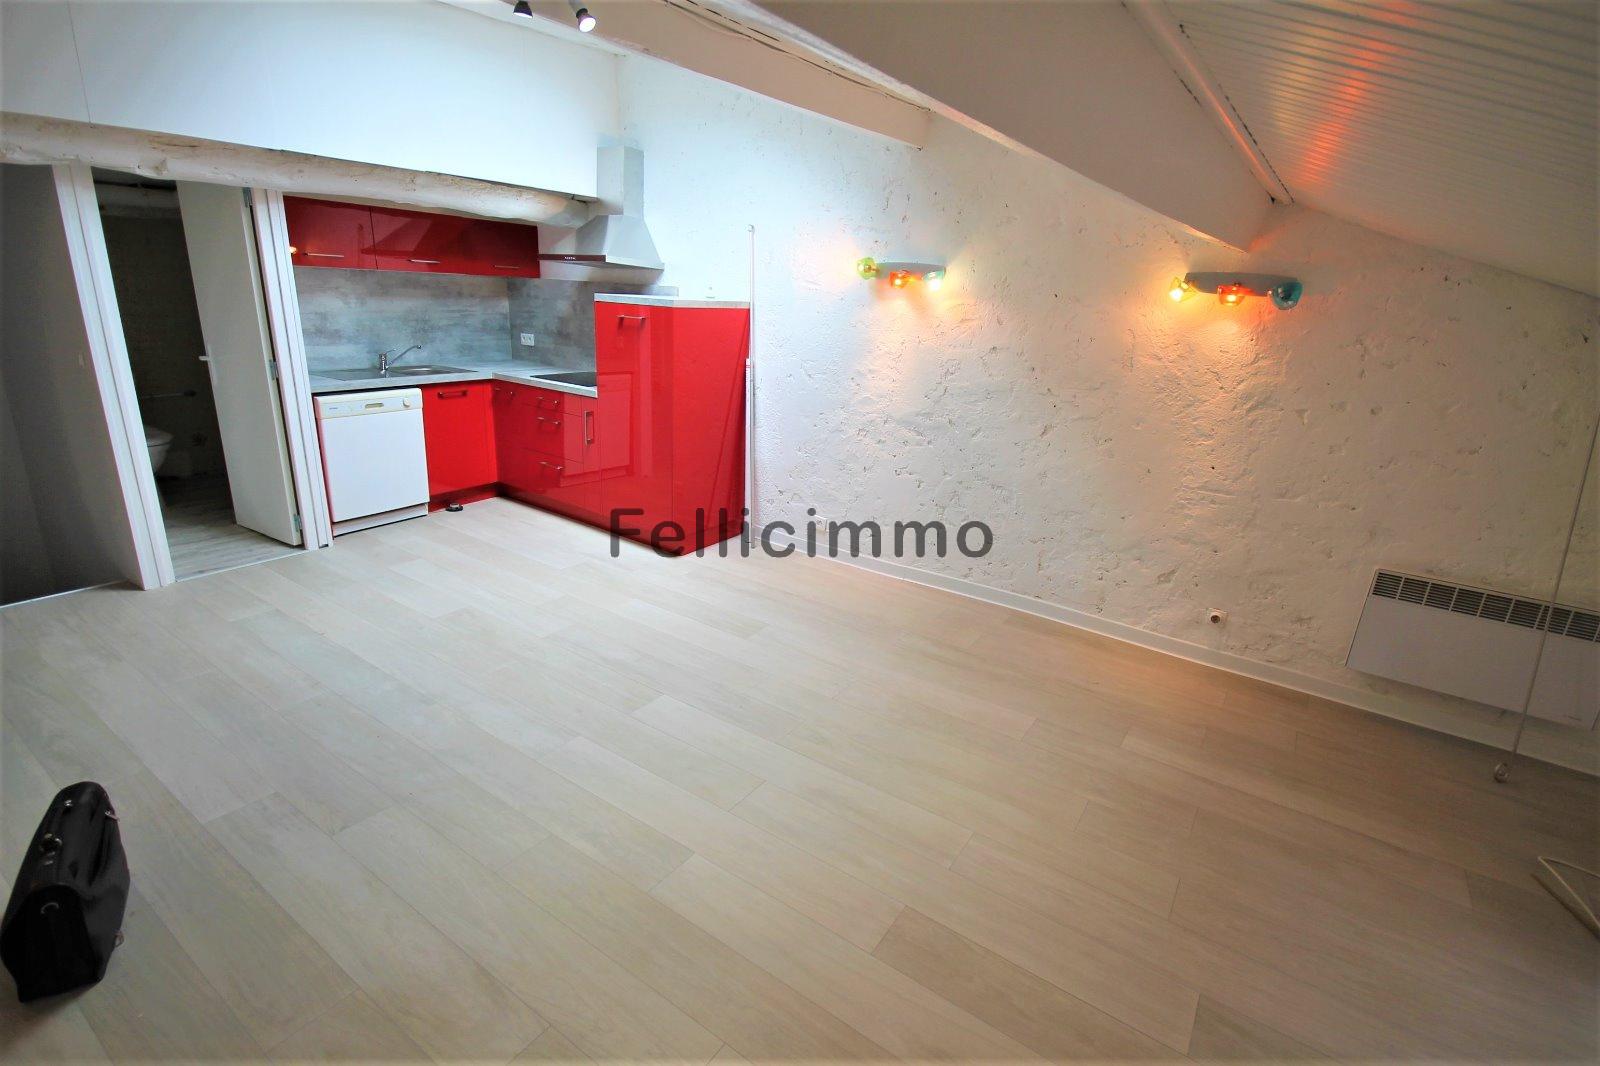 Offres de location Appartements Vallauris (06220)